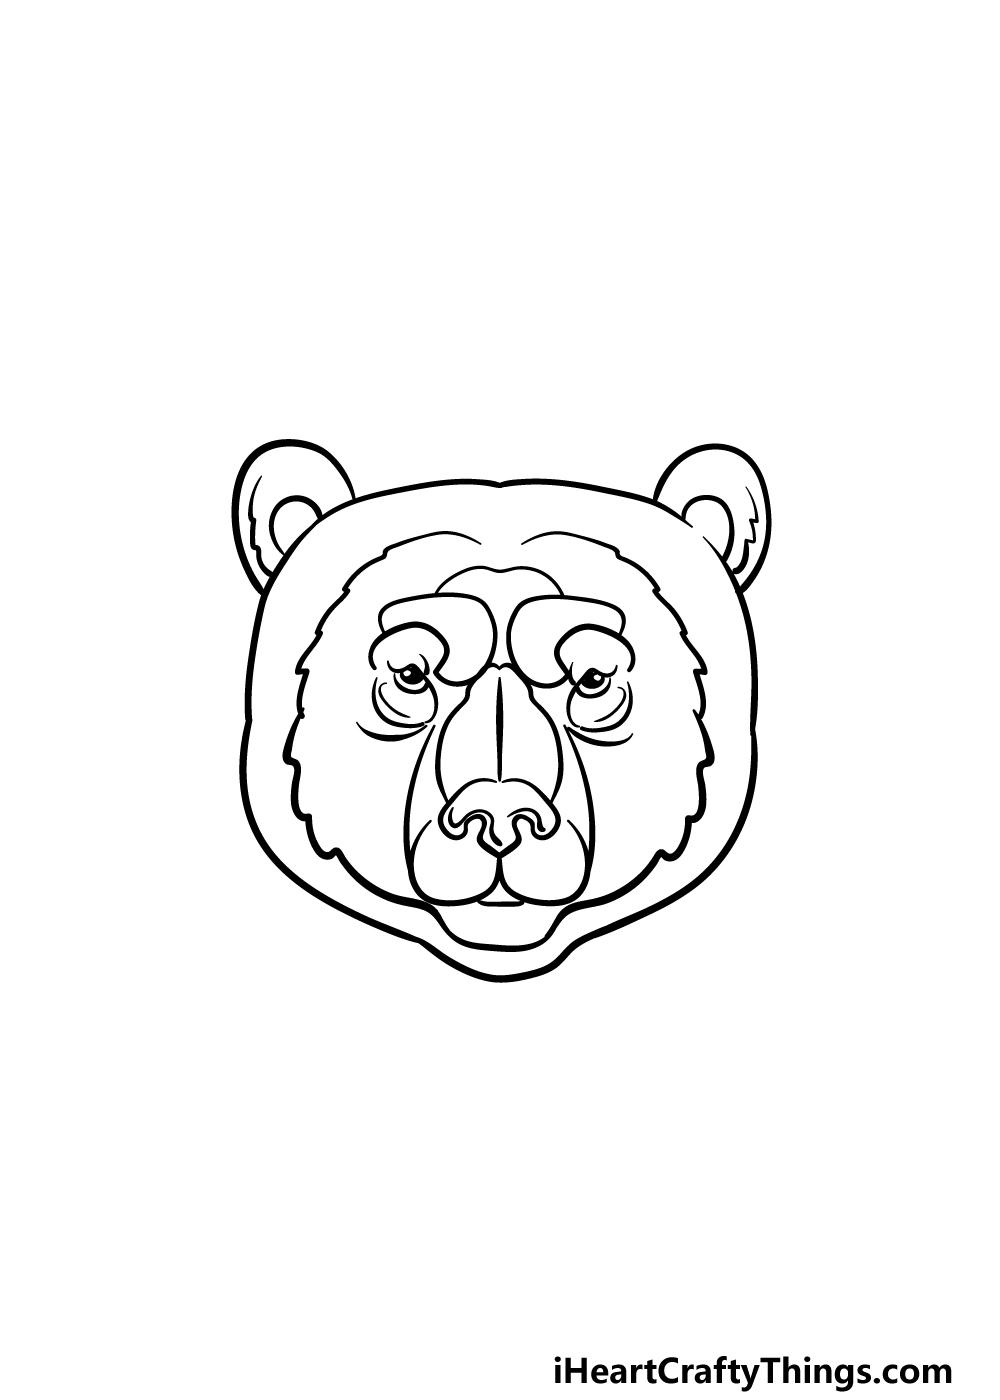 drawing a bear face step 5